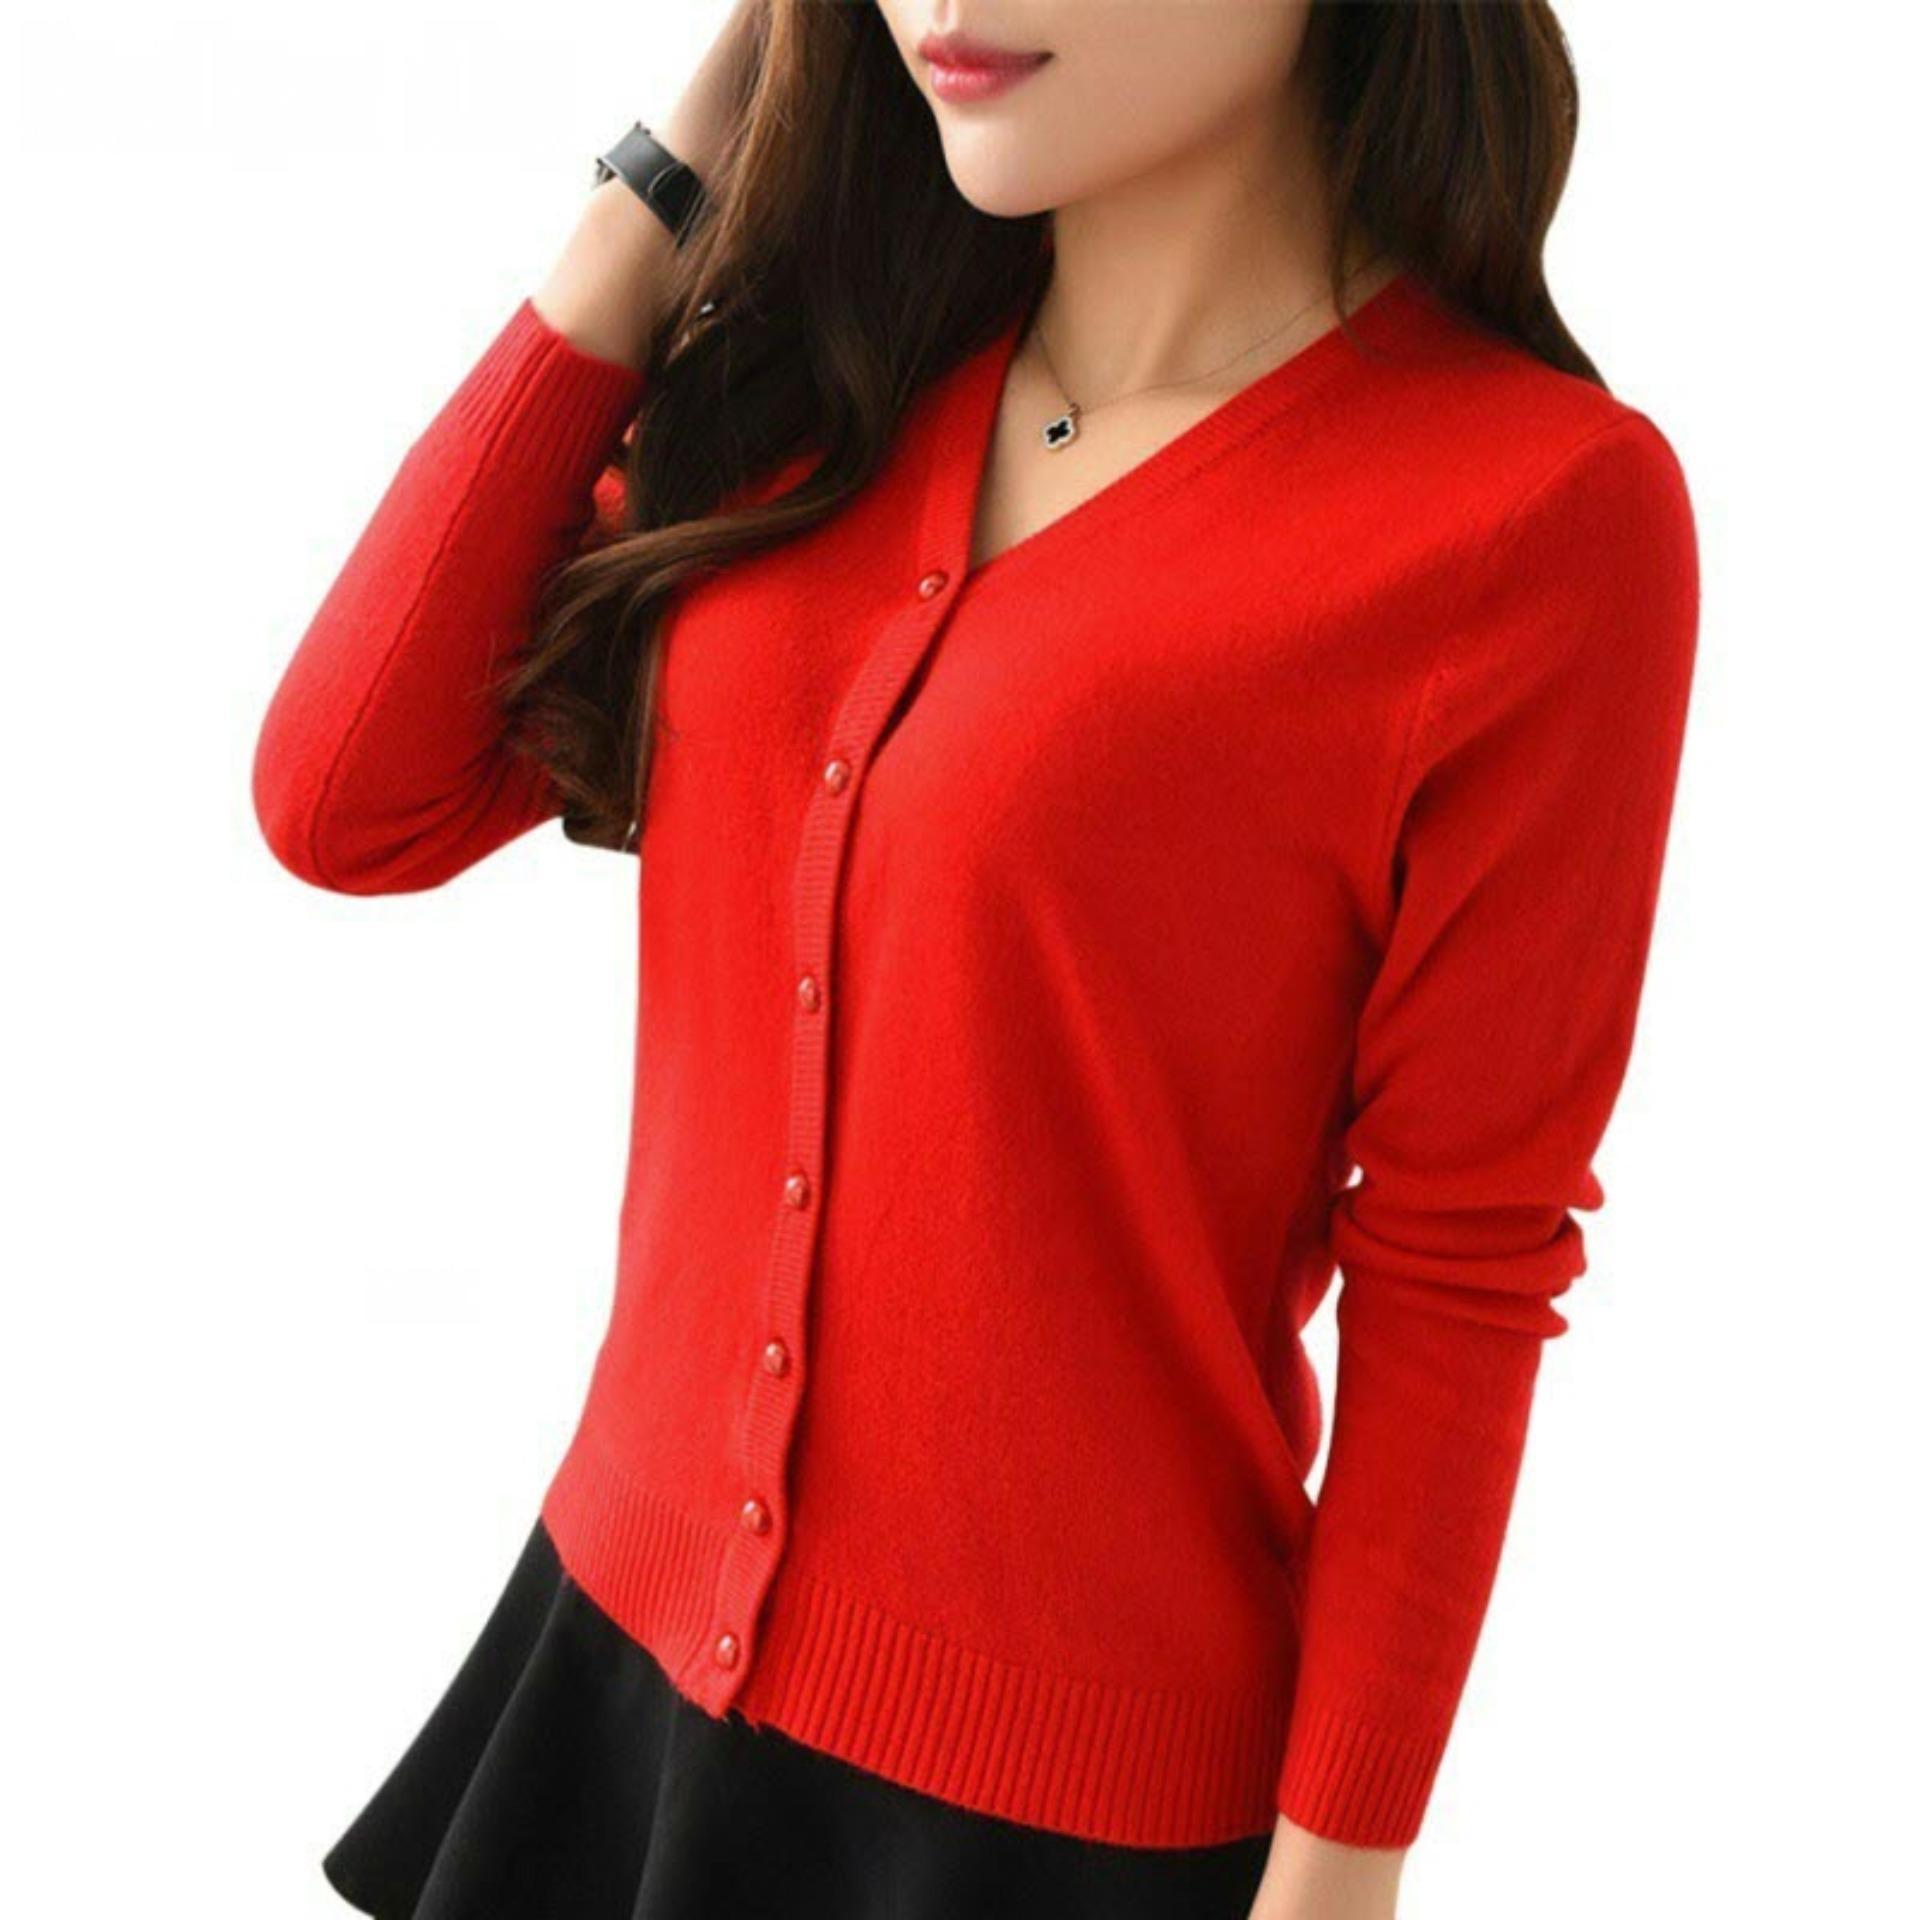 Cardigan Wanita Rajut MSR173 / Kardigan / Sweater / Jaket / Baju Hangat / Luaran /